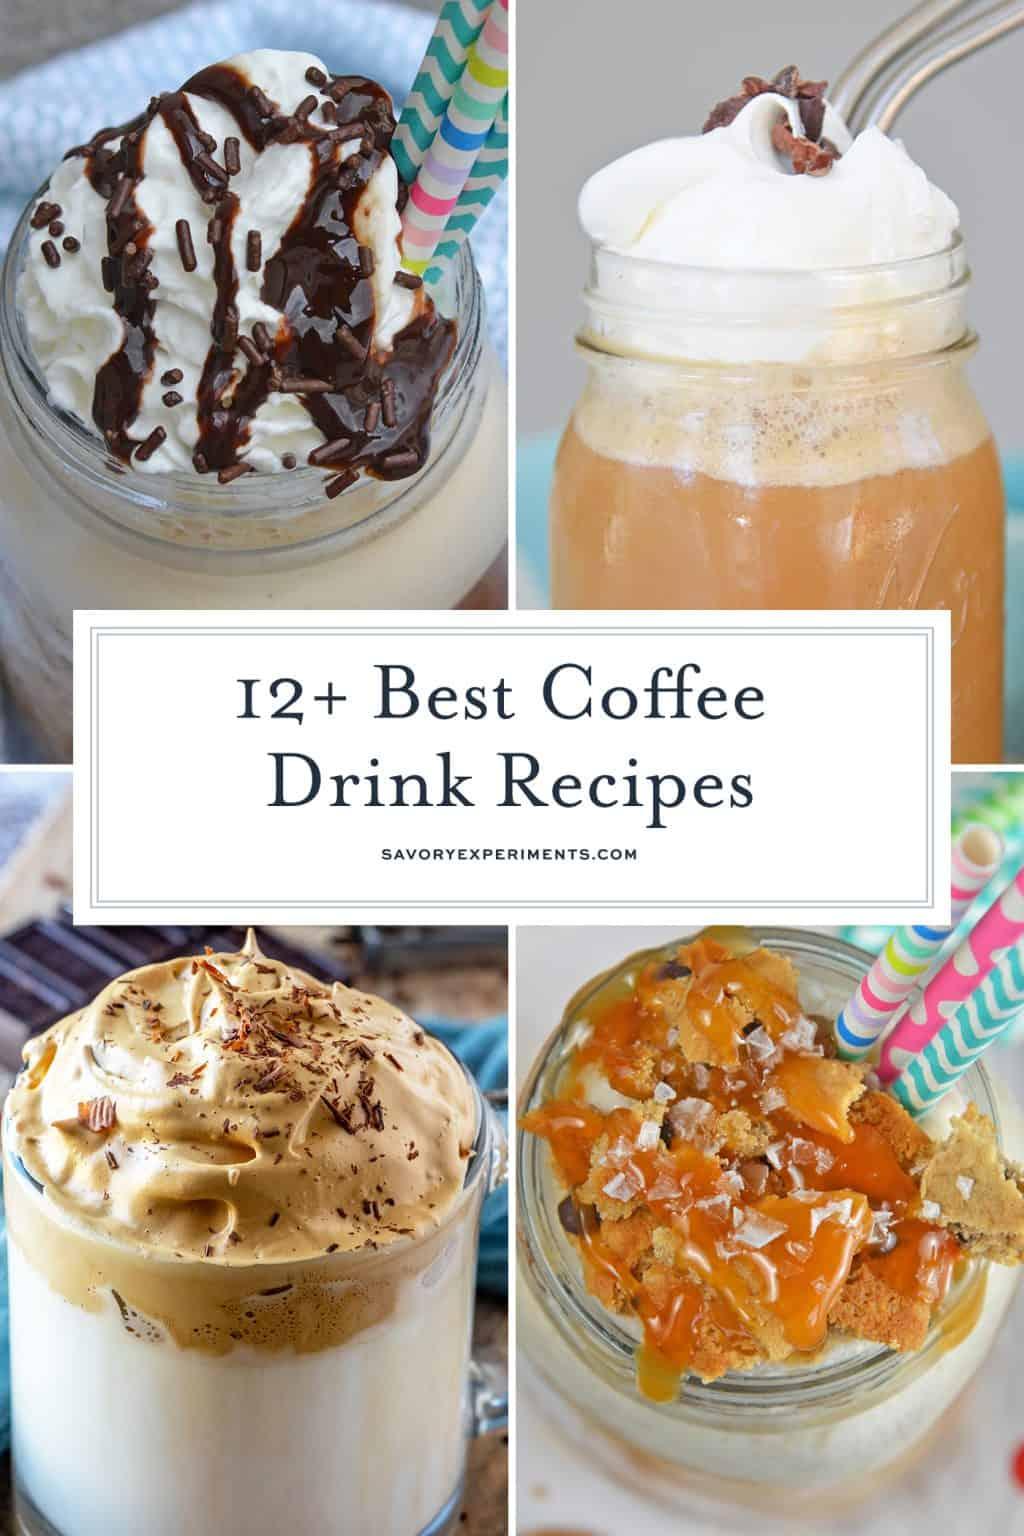 15+ Coffee Drink Recipes